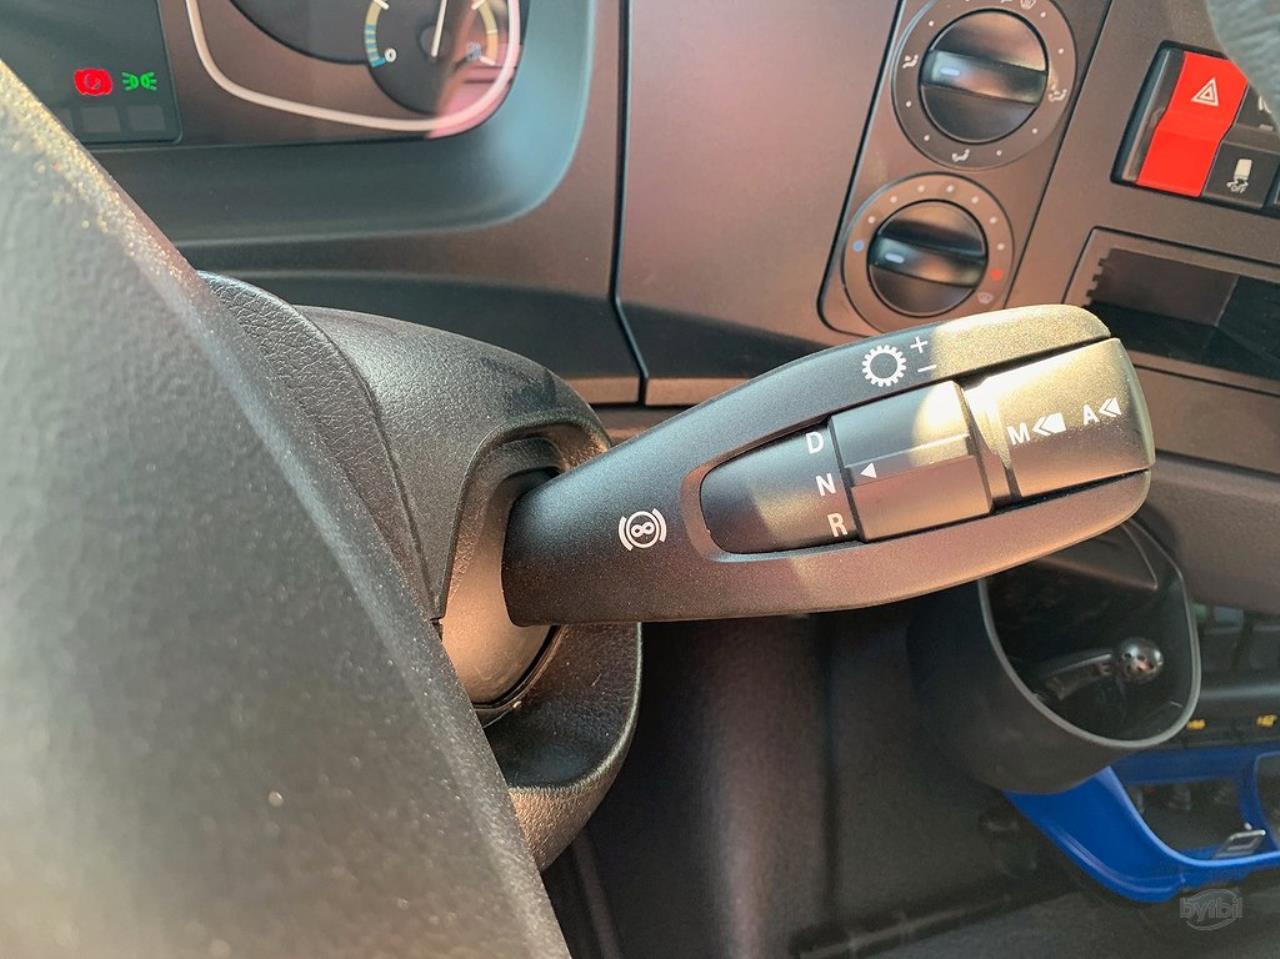 Mercedes-Benz Atego 1224 L 4x2 Kranbil Fullutrustad 2020 - Kran